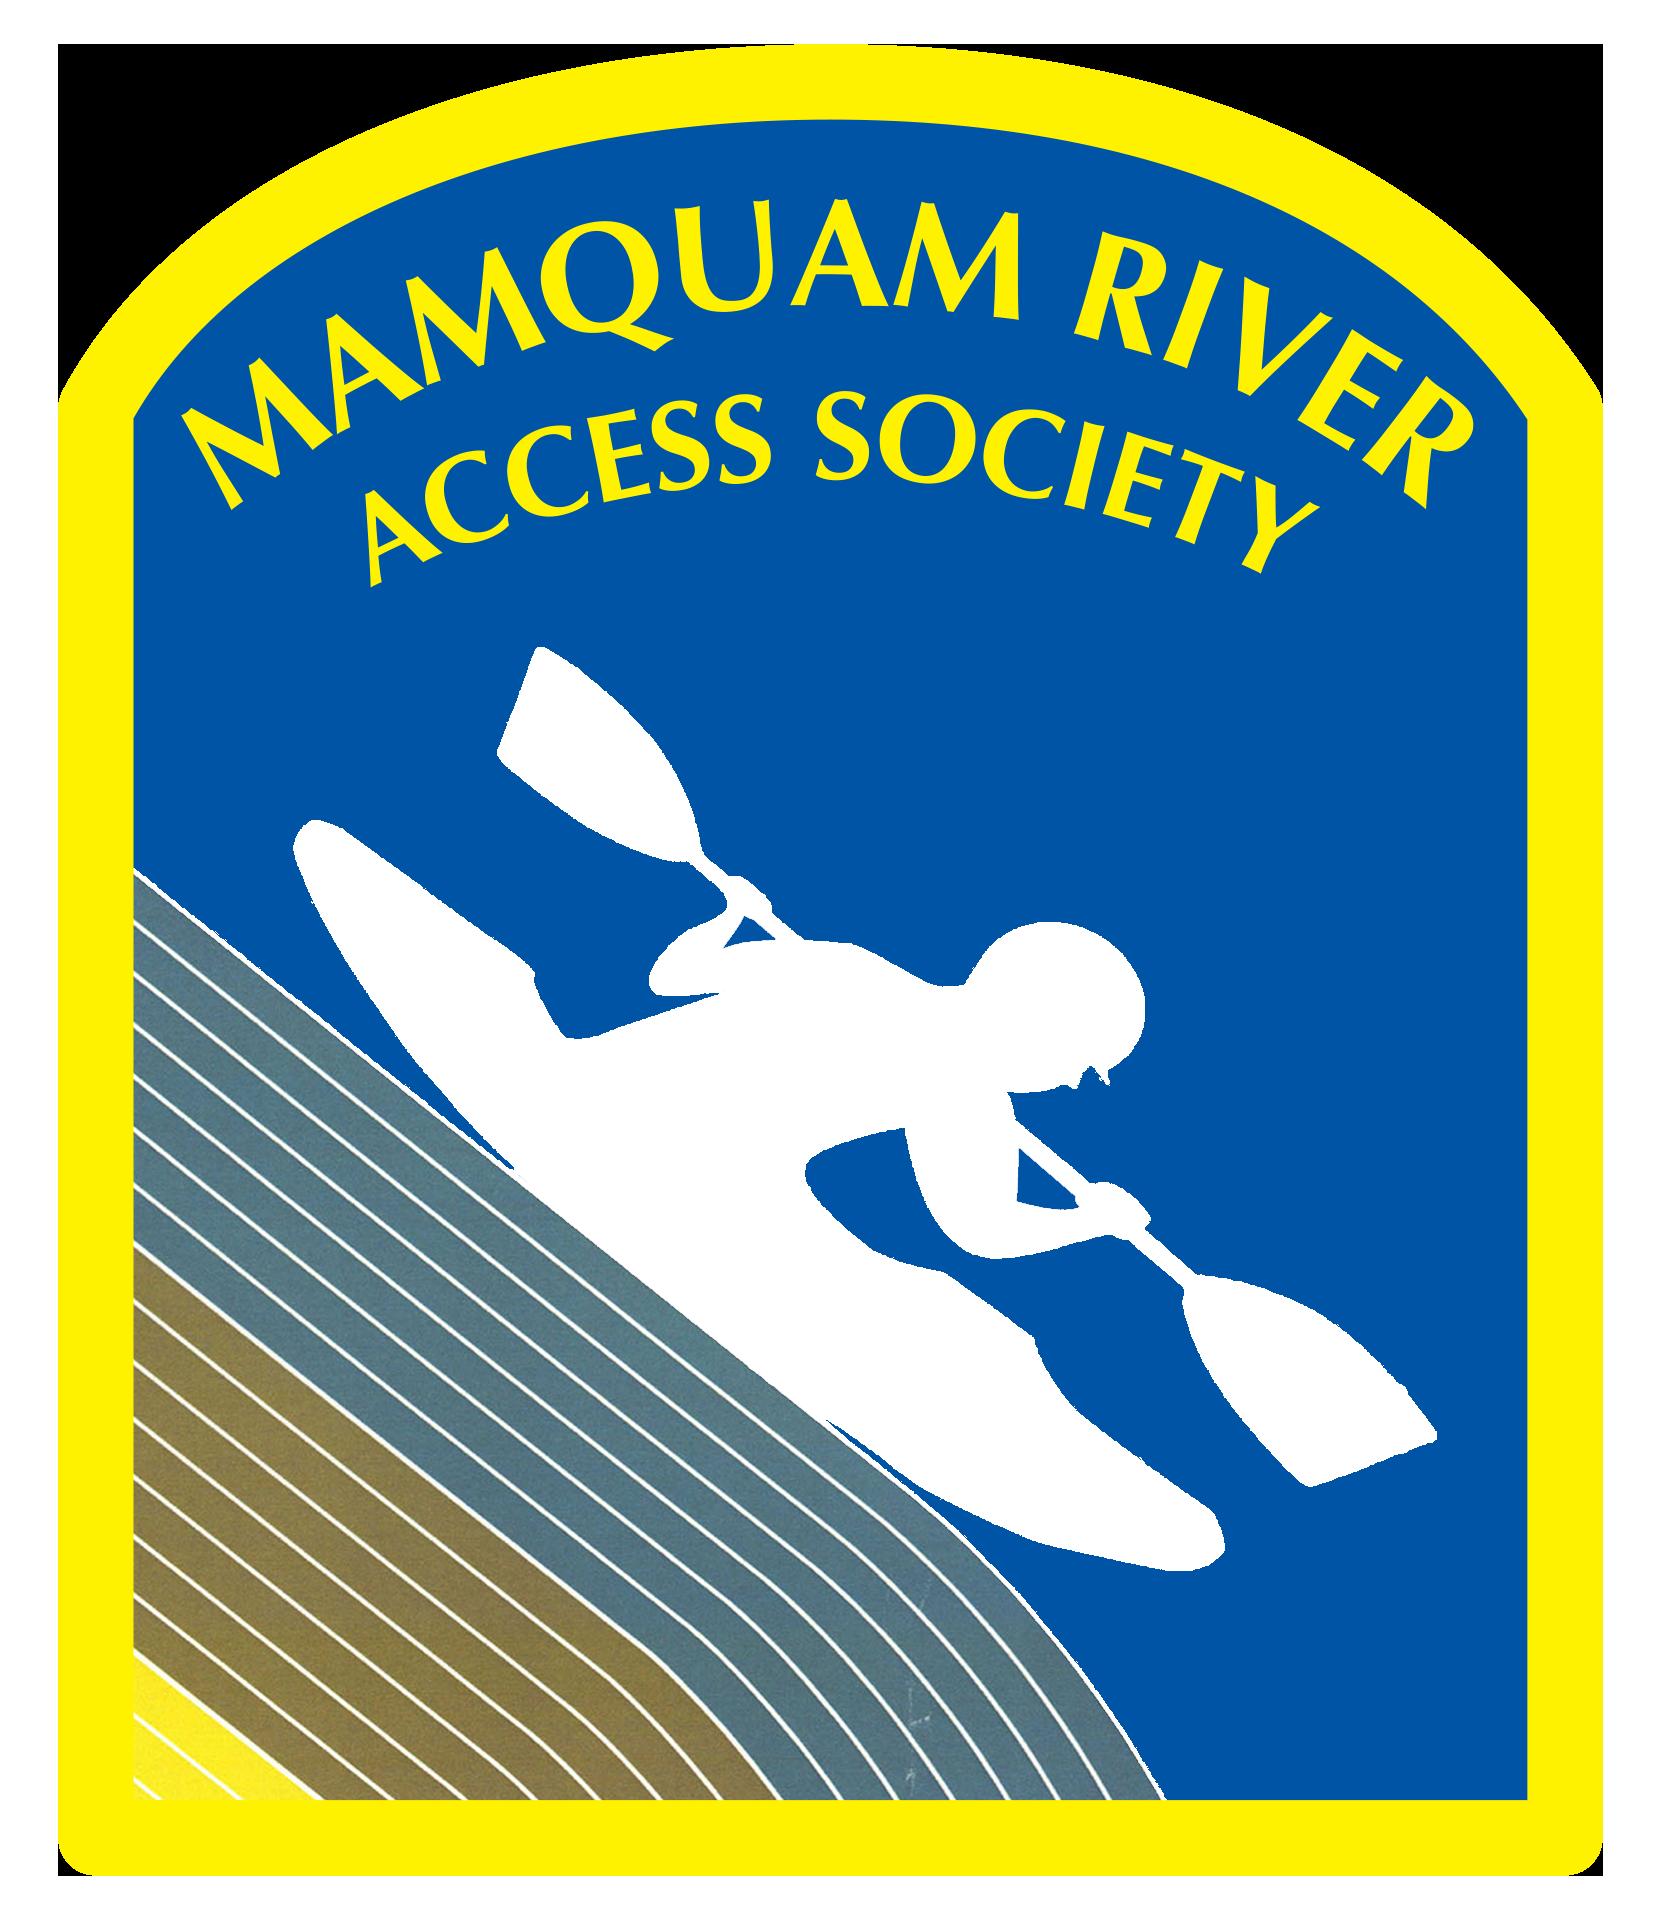 Firewood clipart bonfire night. Map directions mamquam river